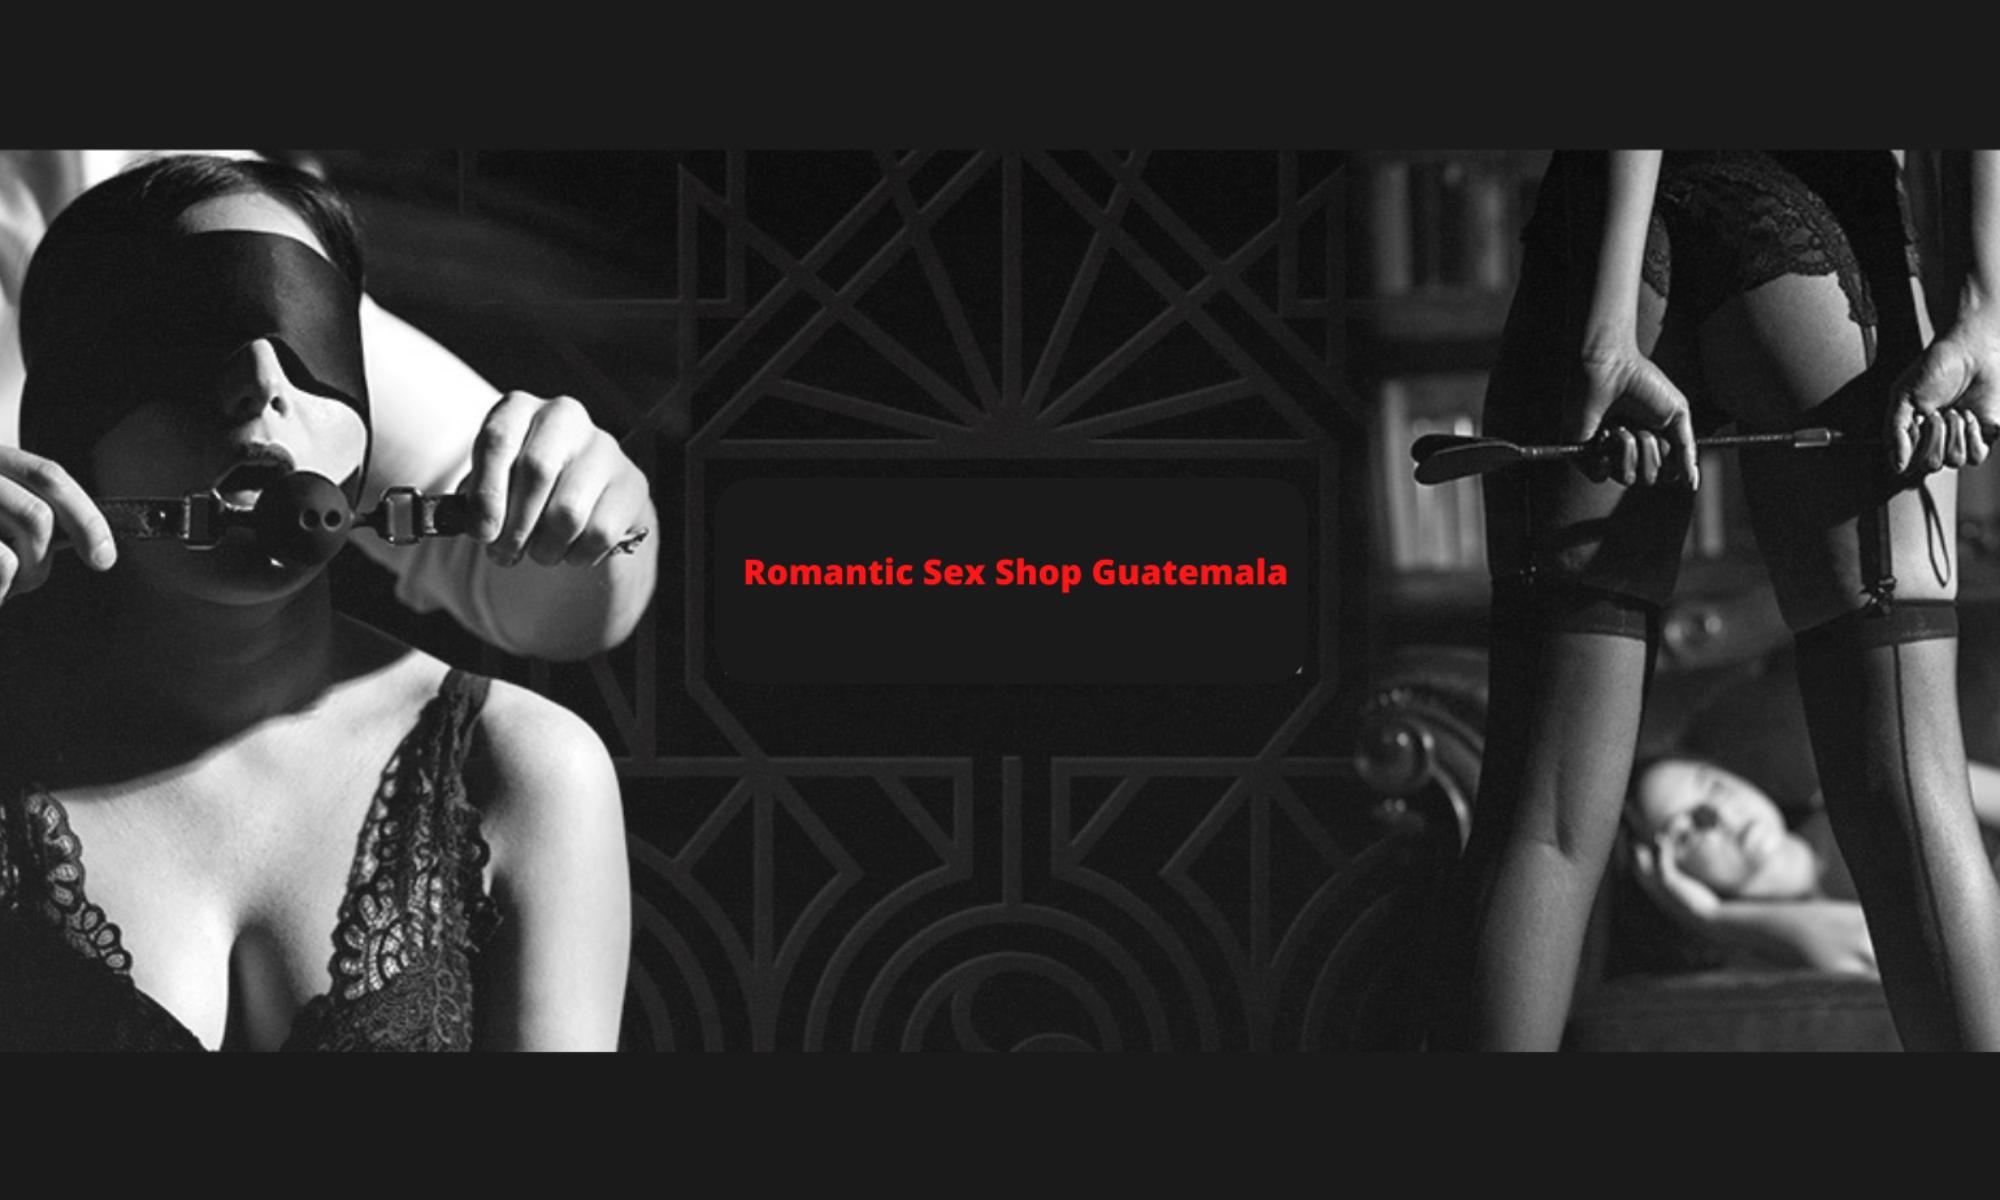 Romantic Sex Shop Guatemala